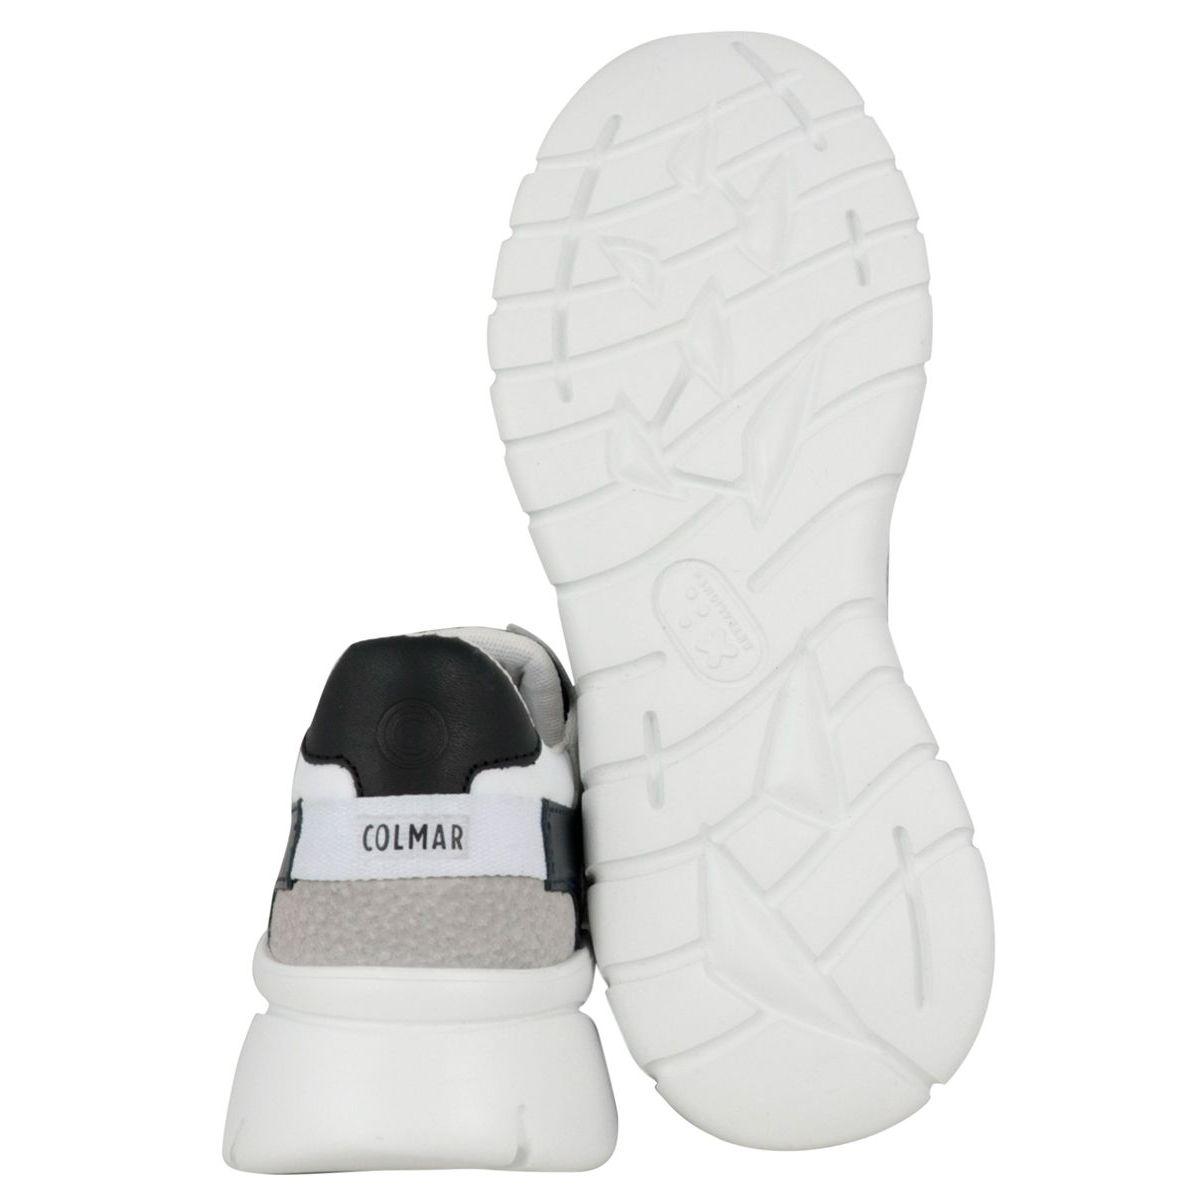 Supreme Hyde sneakers Navy / b.co Colmar Shoes